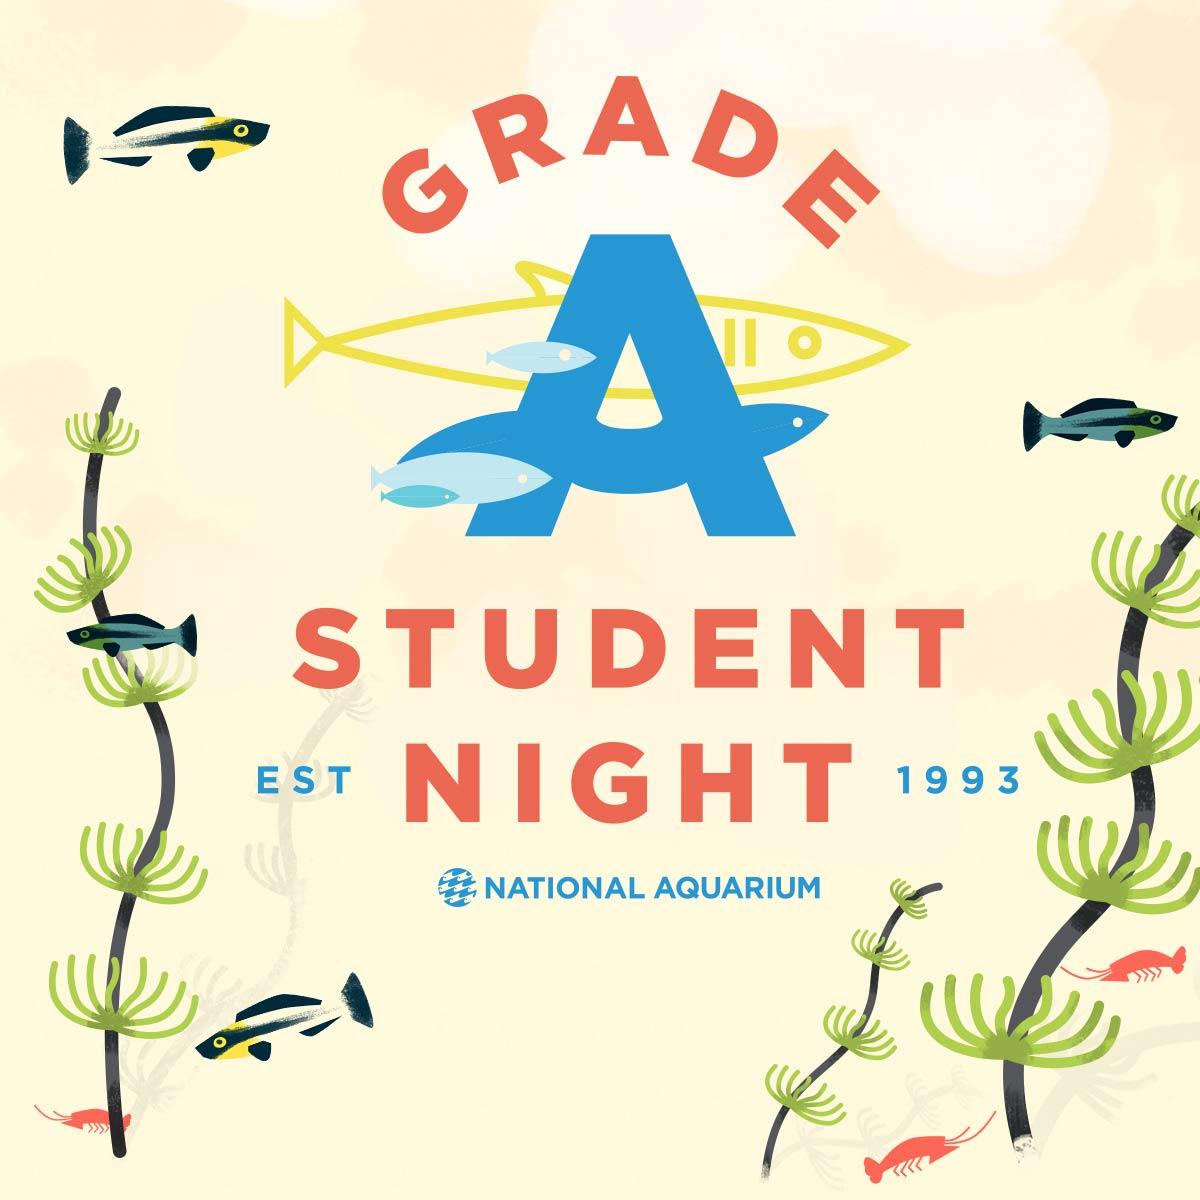 Grade A Student Night